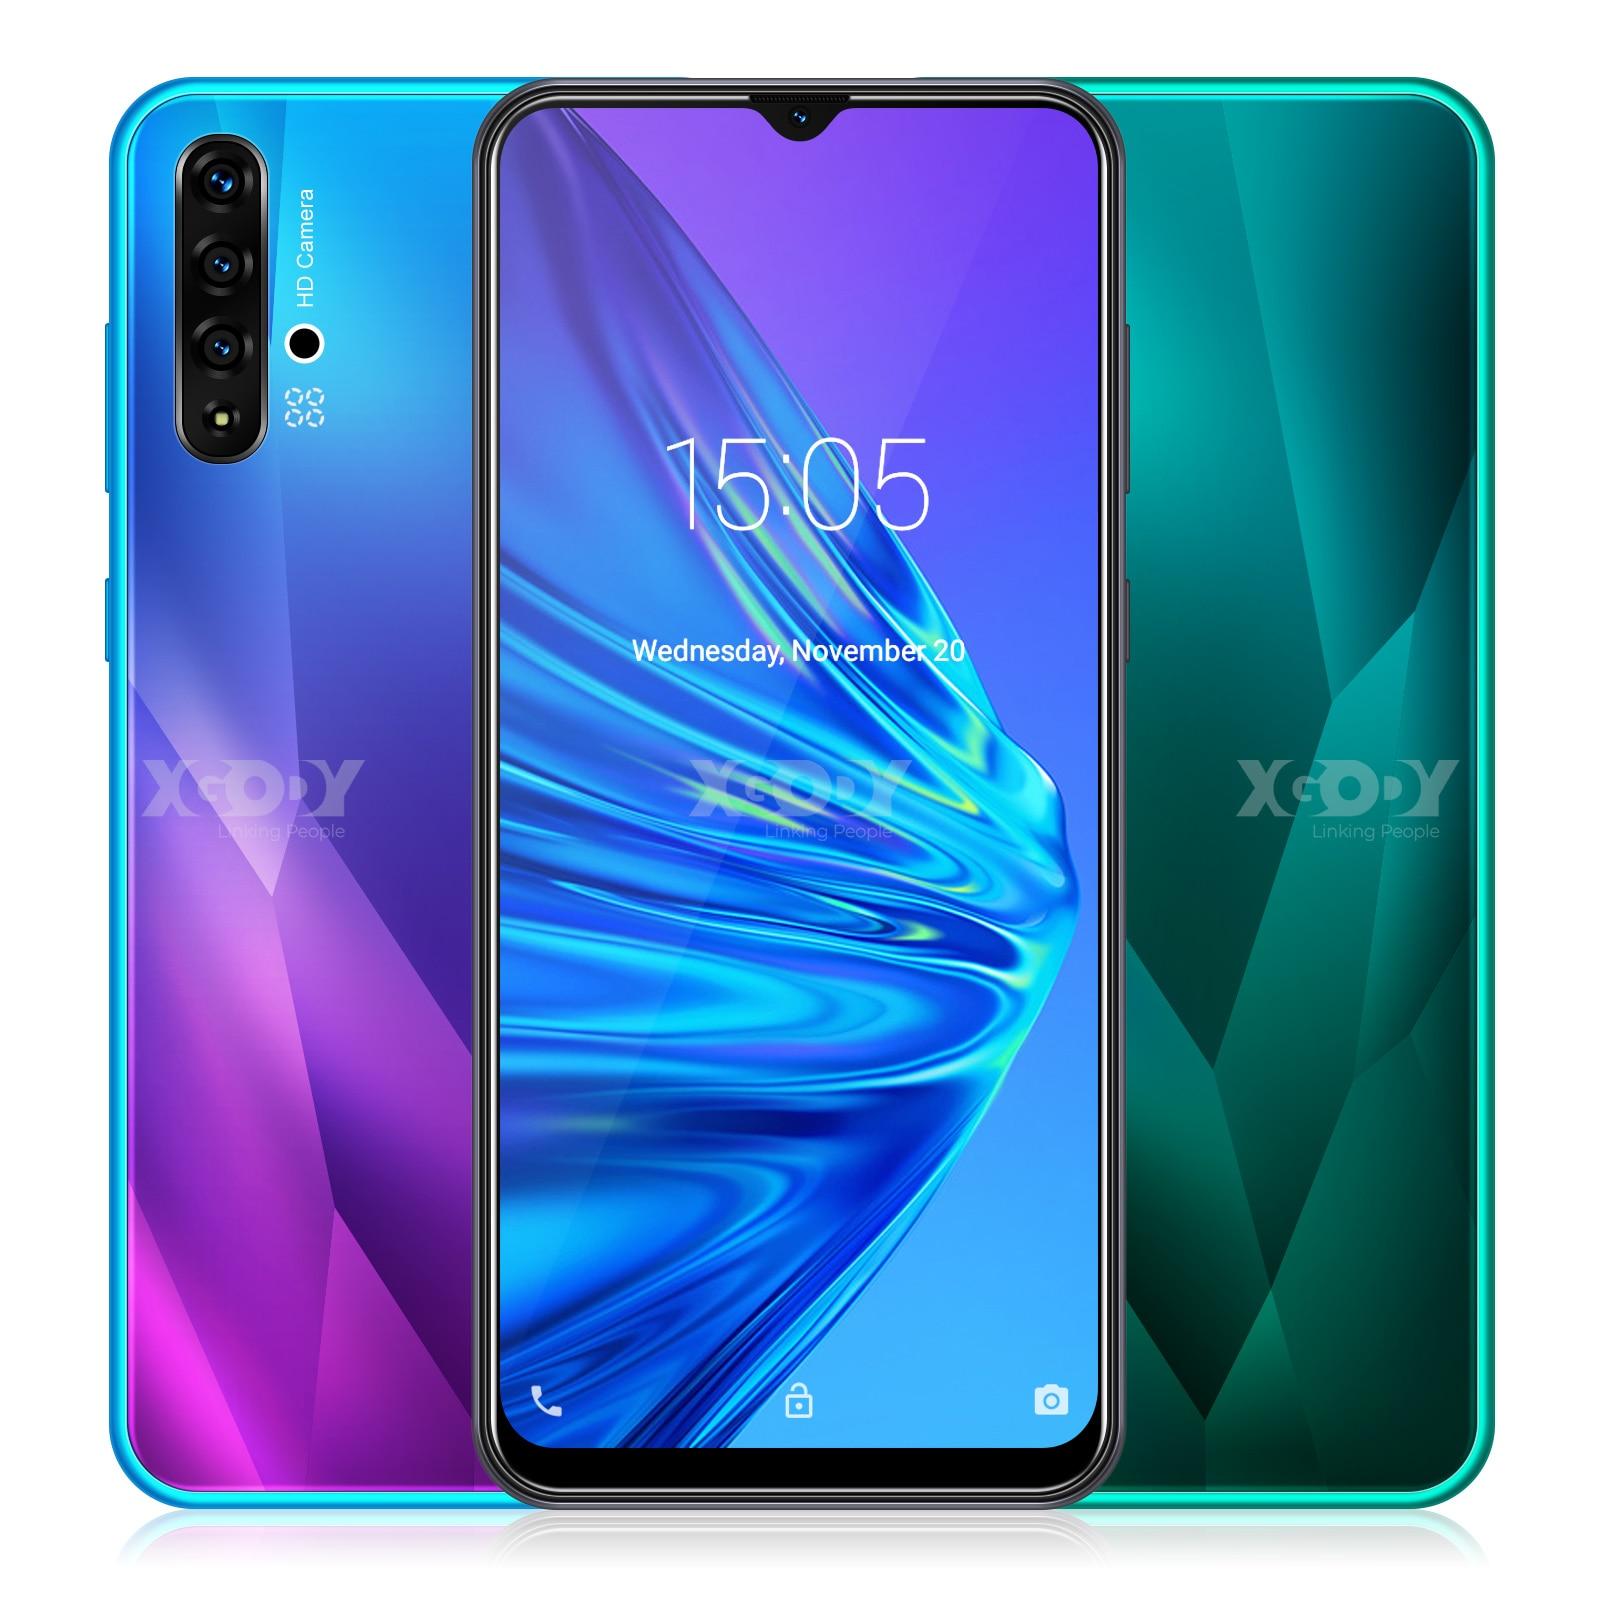 XGODY 6,5 pulgadas de agua teléfono inteligente Android 9,0 1GB 4GB MTK6580 Quad Core MP 3000mAh Cámara teléfonos móviles 3G GPS WiFi teléfono móvil